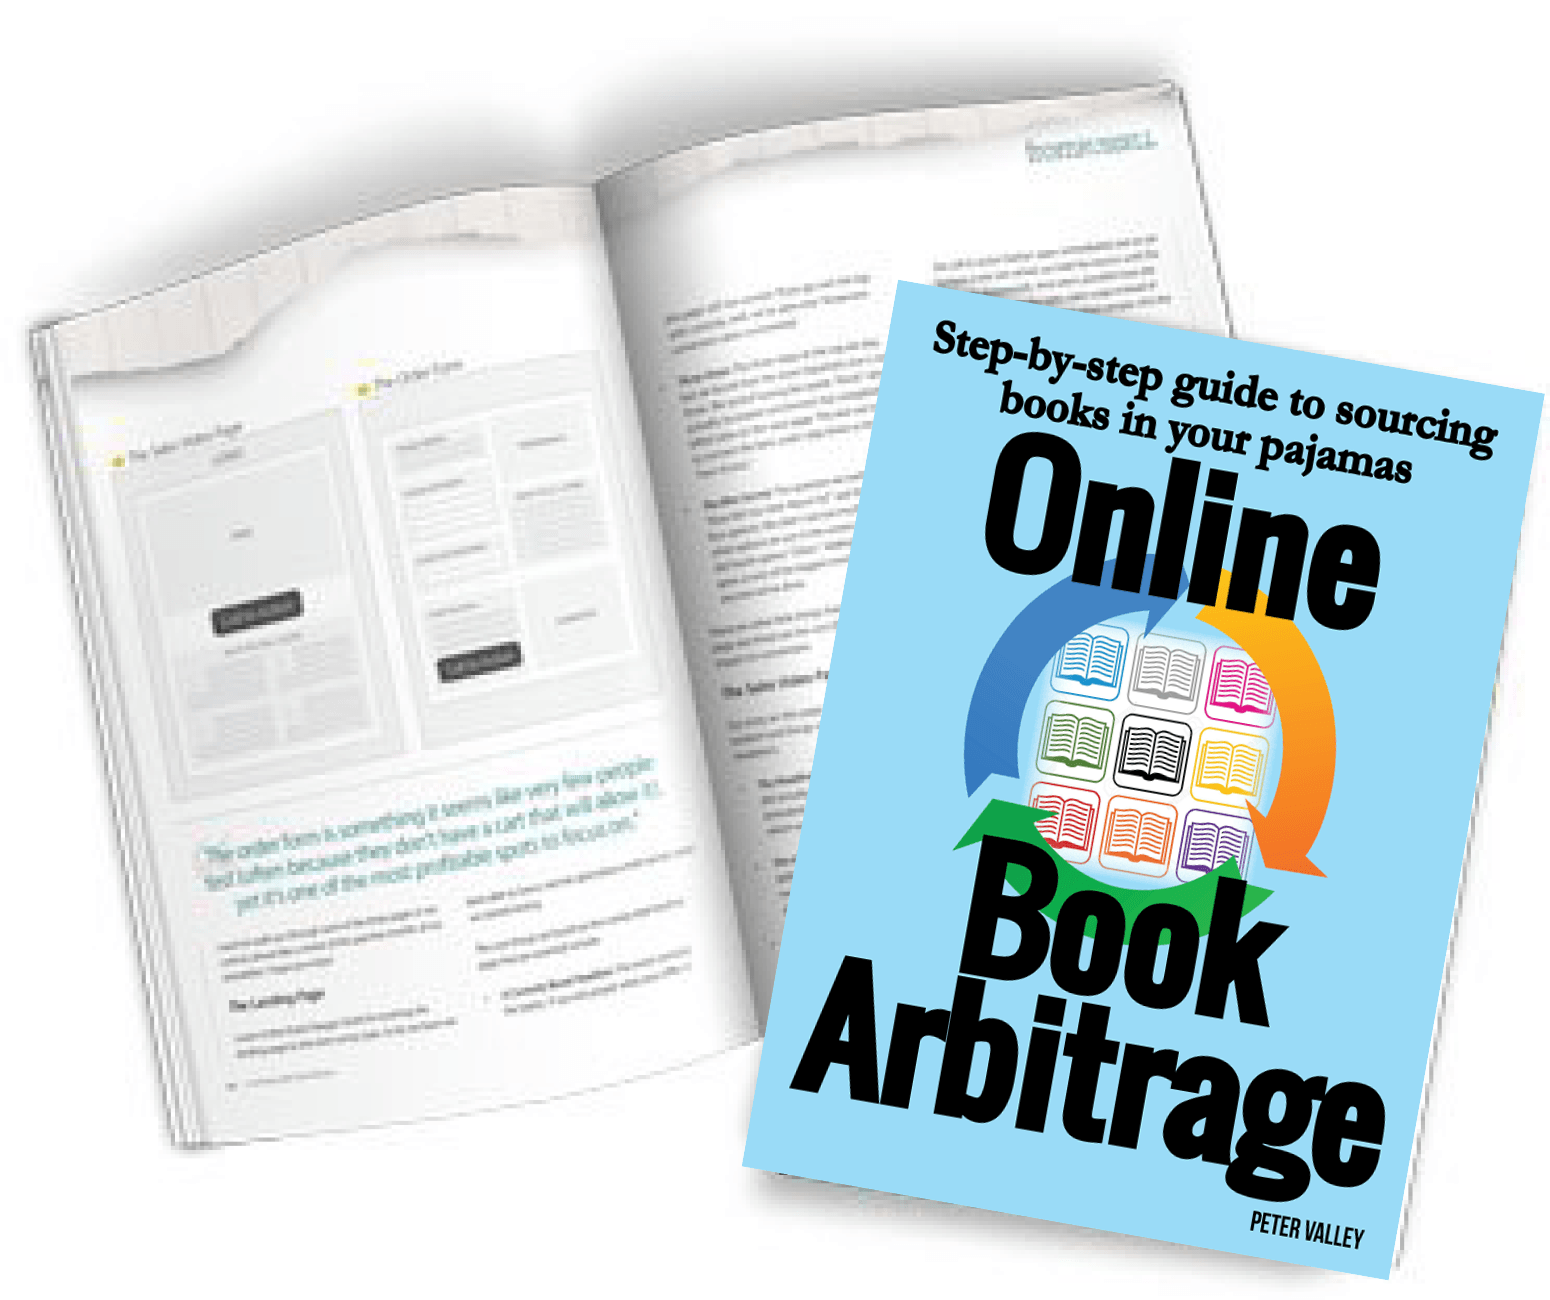 Online Book Arbitrage - Free book